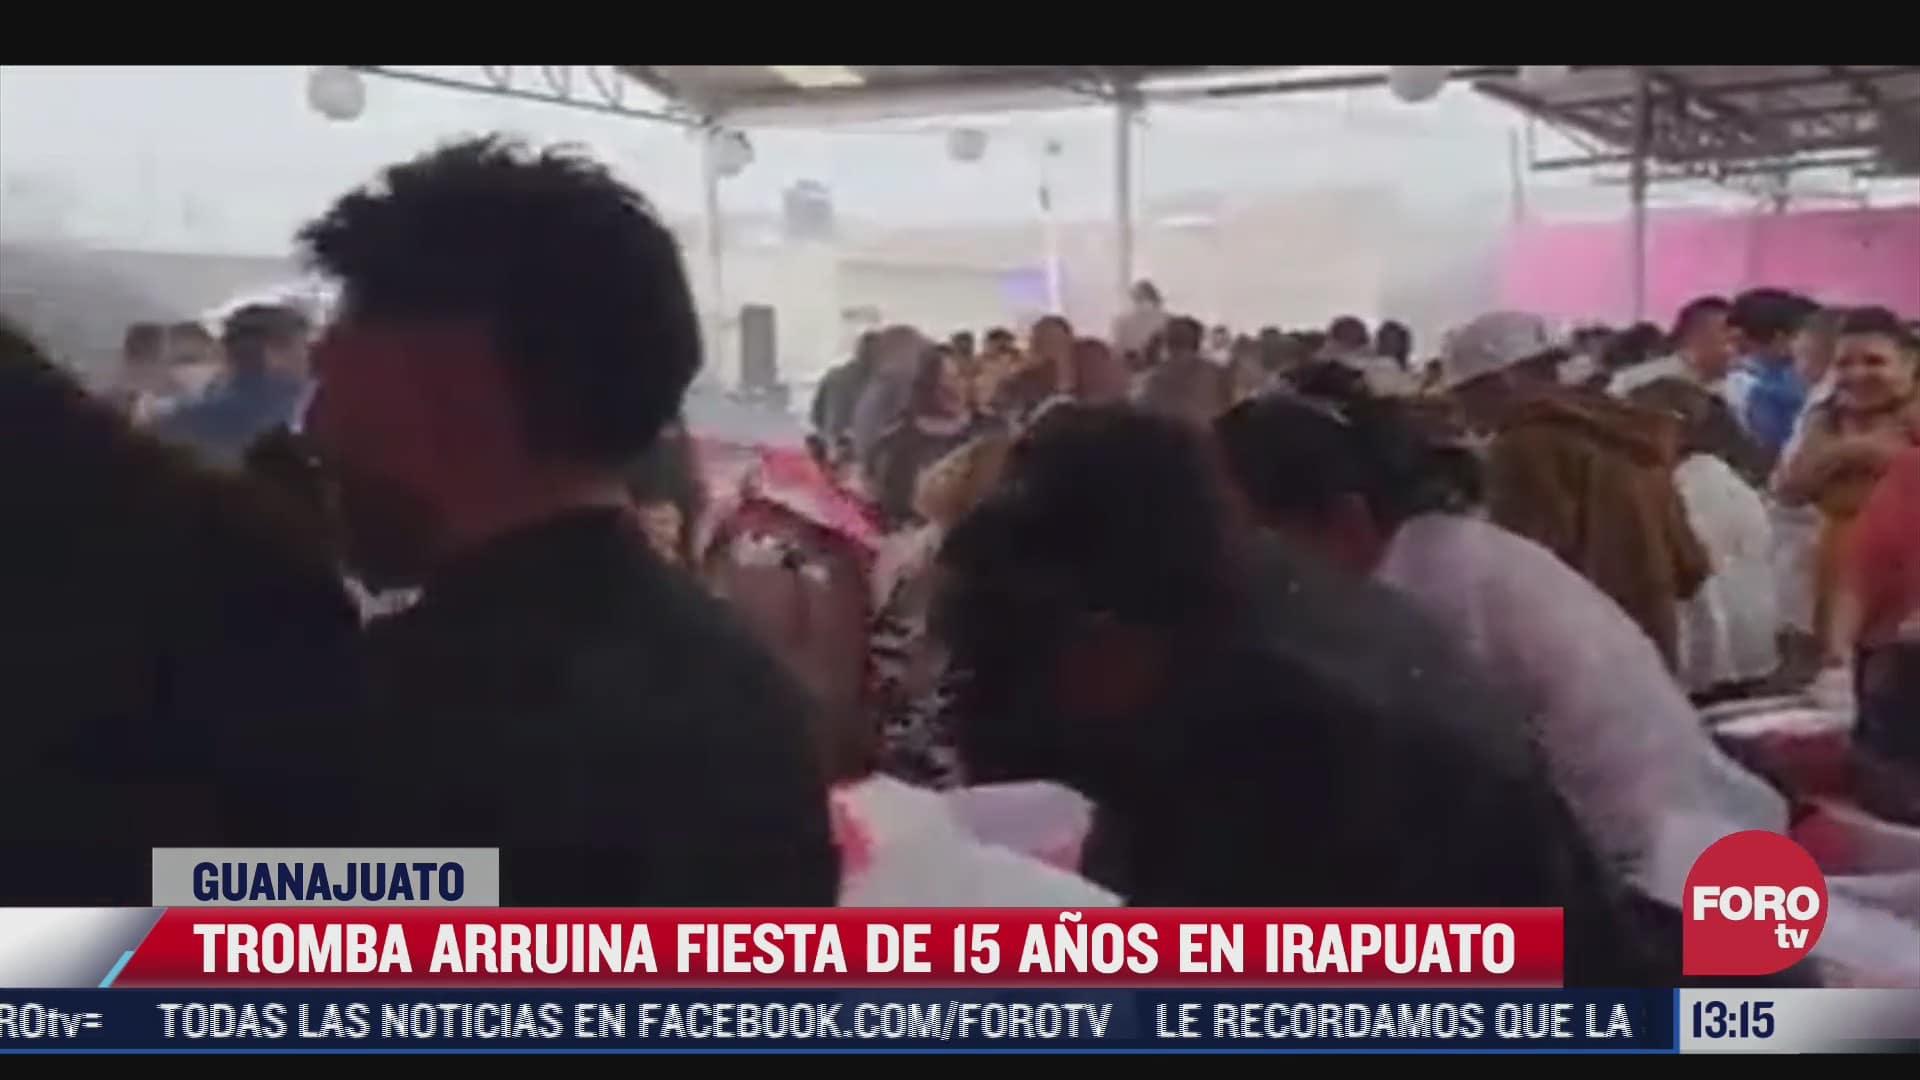 tromba arruina fiesta de 15 anos en irapuato guanajuato